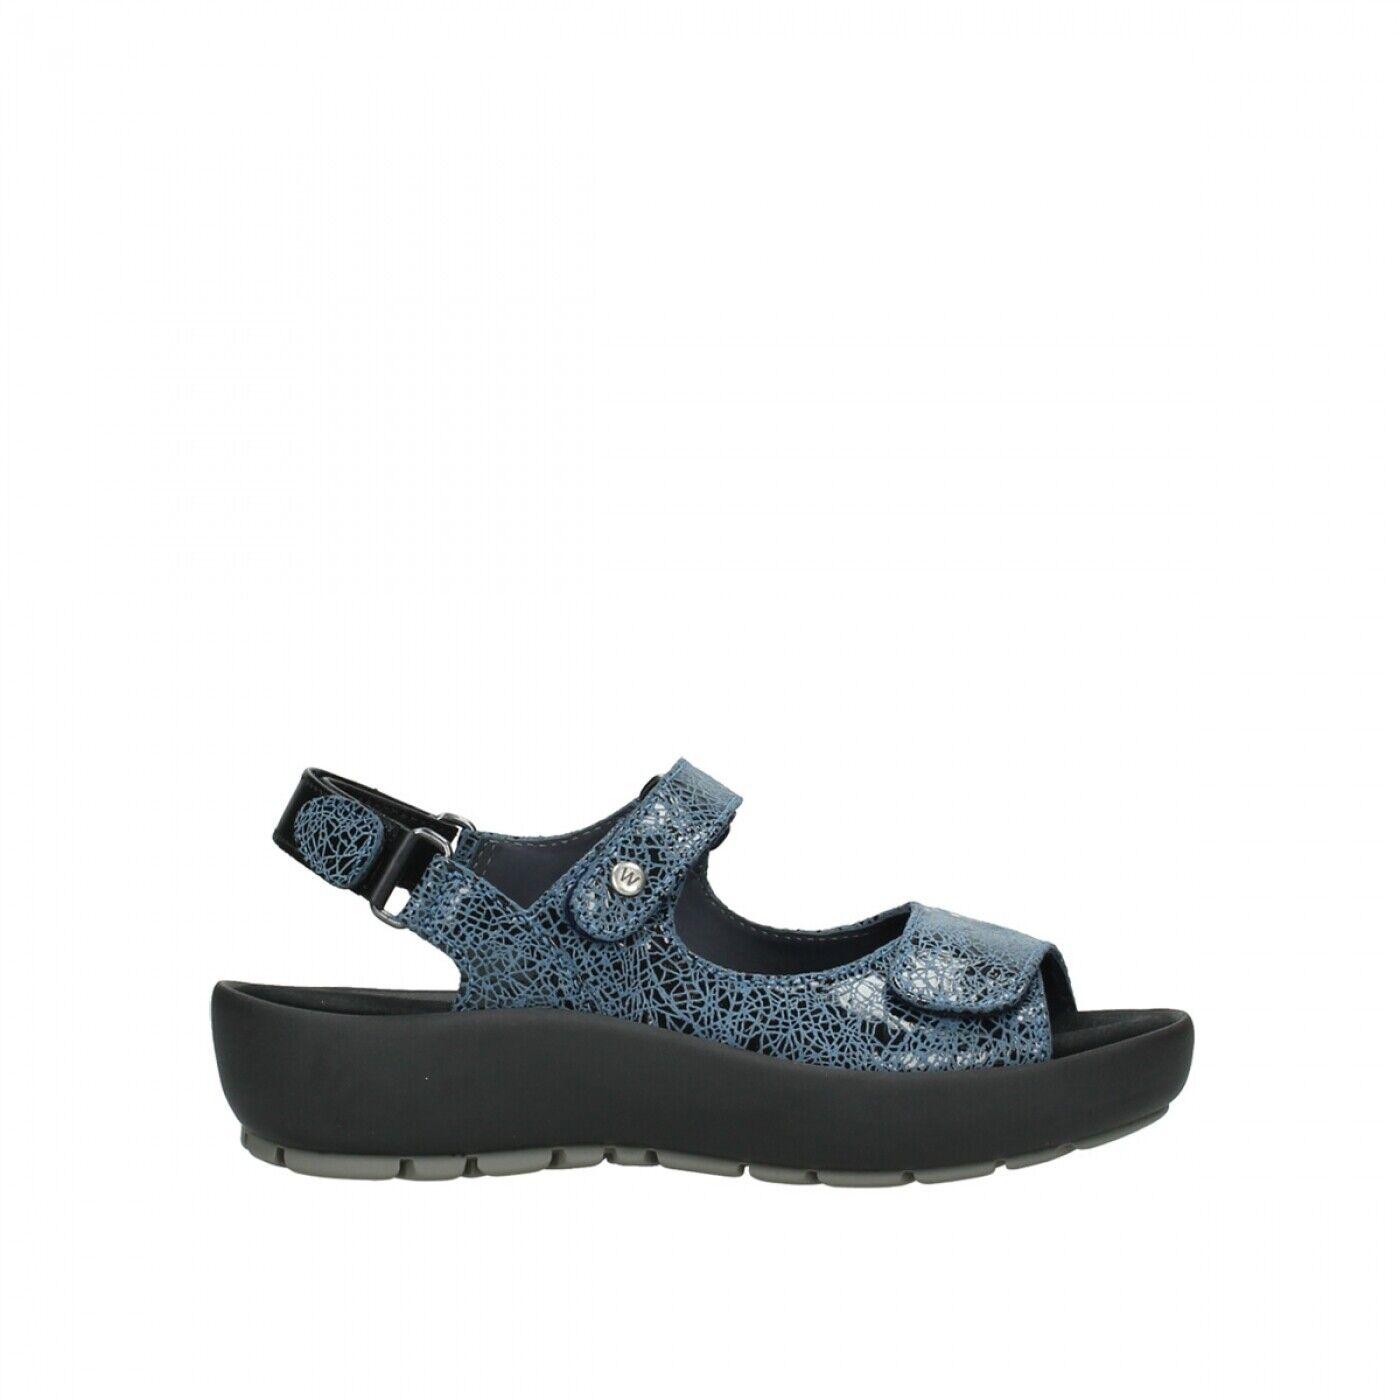 Wolky Rio Crash läder Denis kvinnor Casual gående Sandals